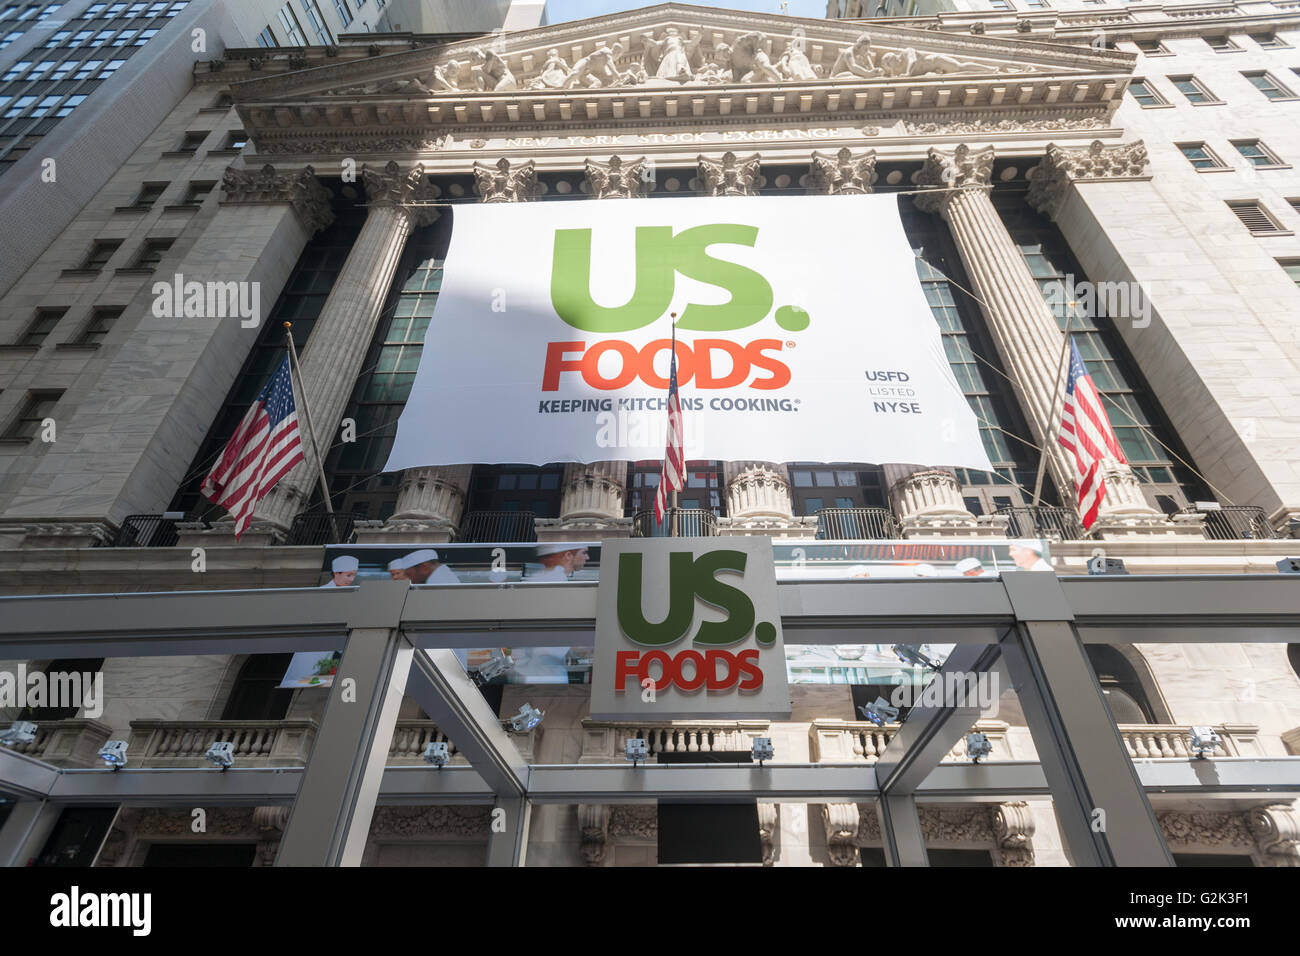 Food Distributors Stock Photos & Food Distributors Stock